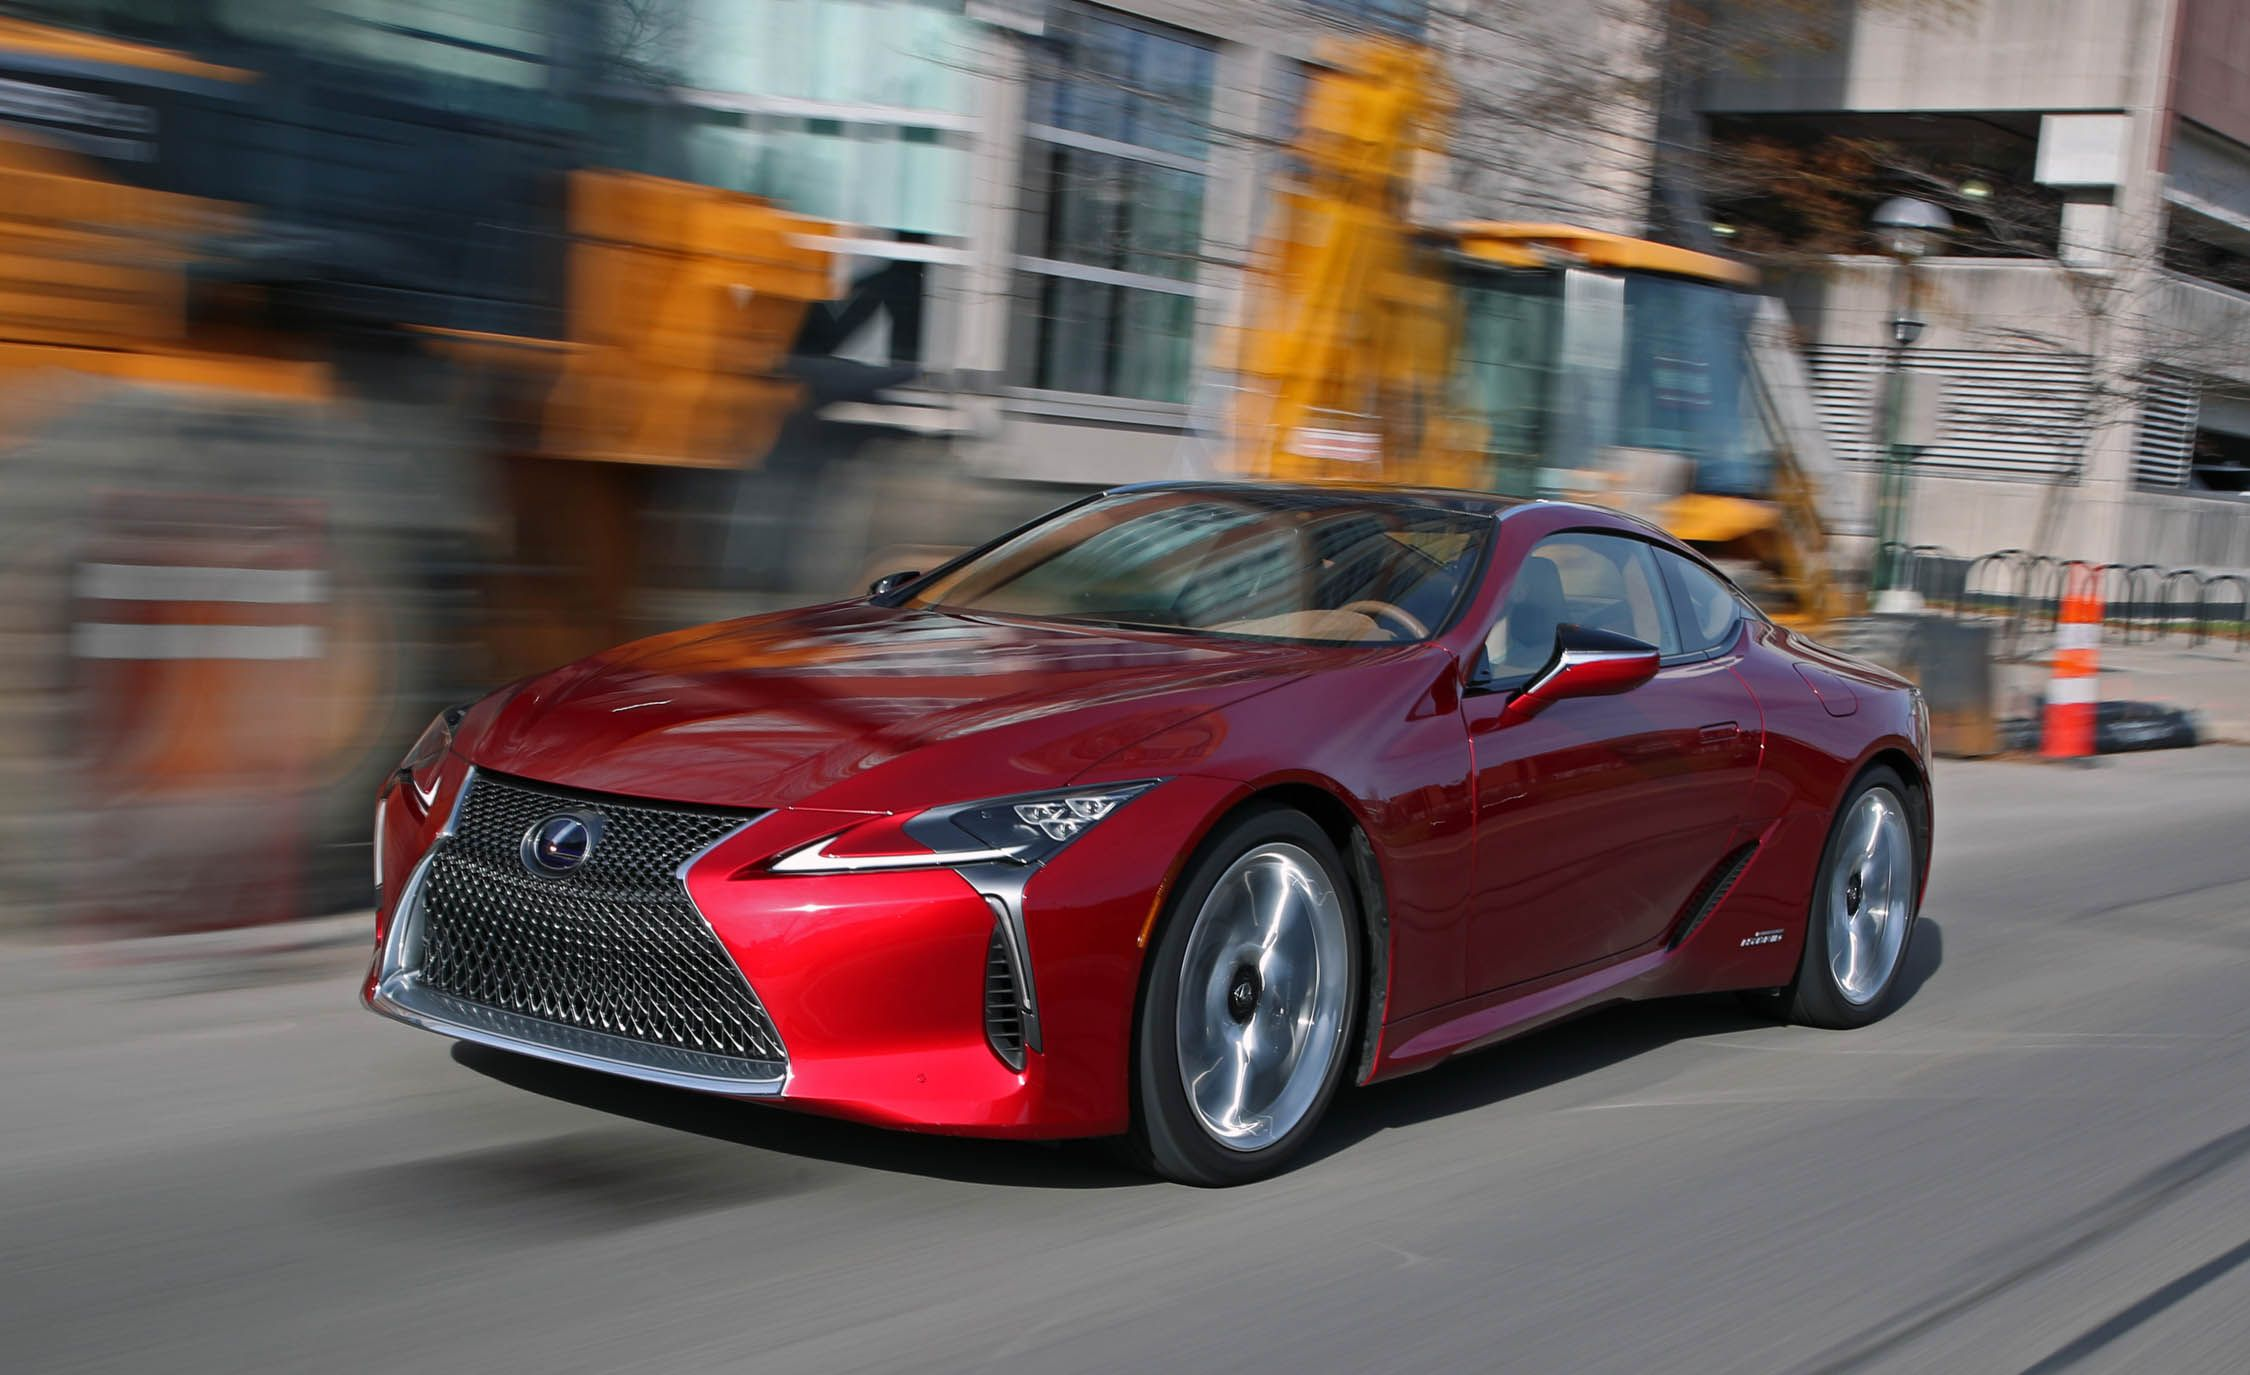 2018 Lexus LC500h Hybrid Test Review